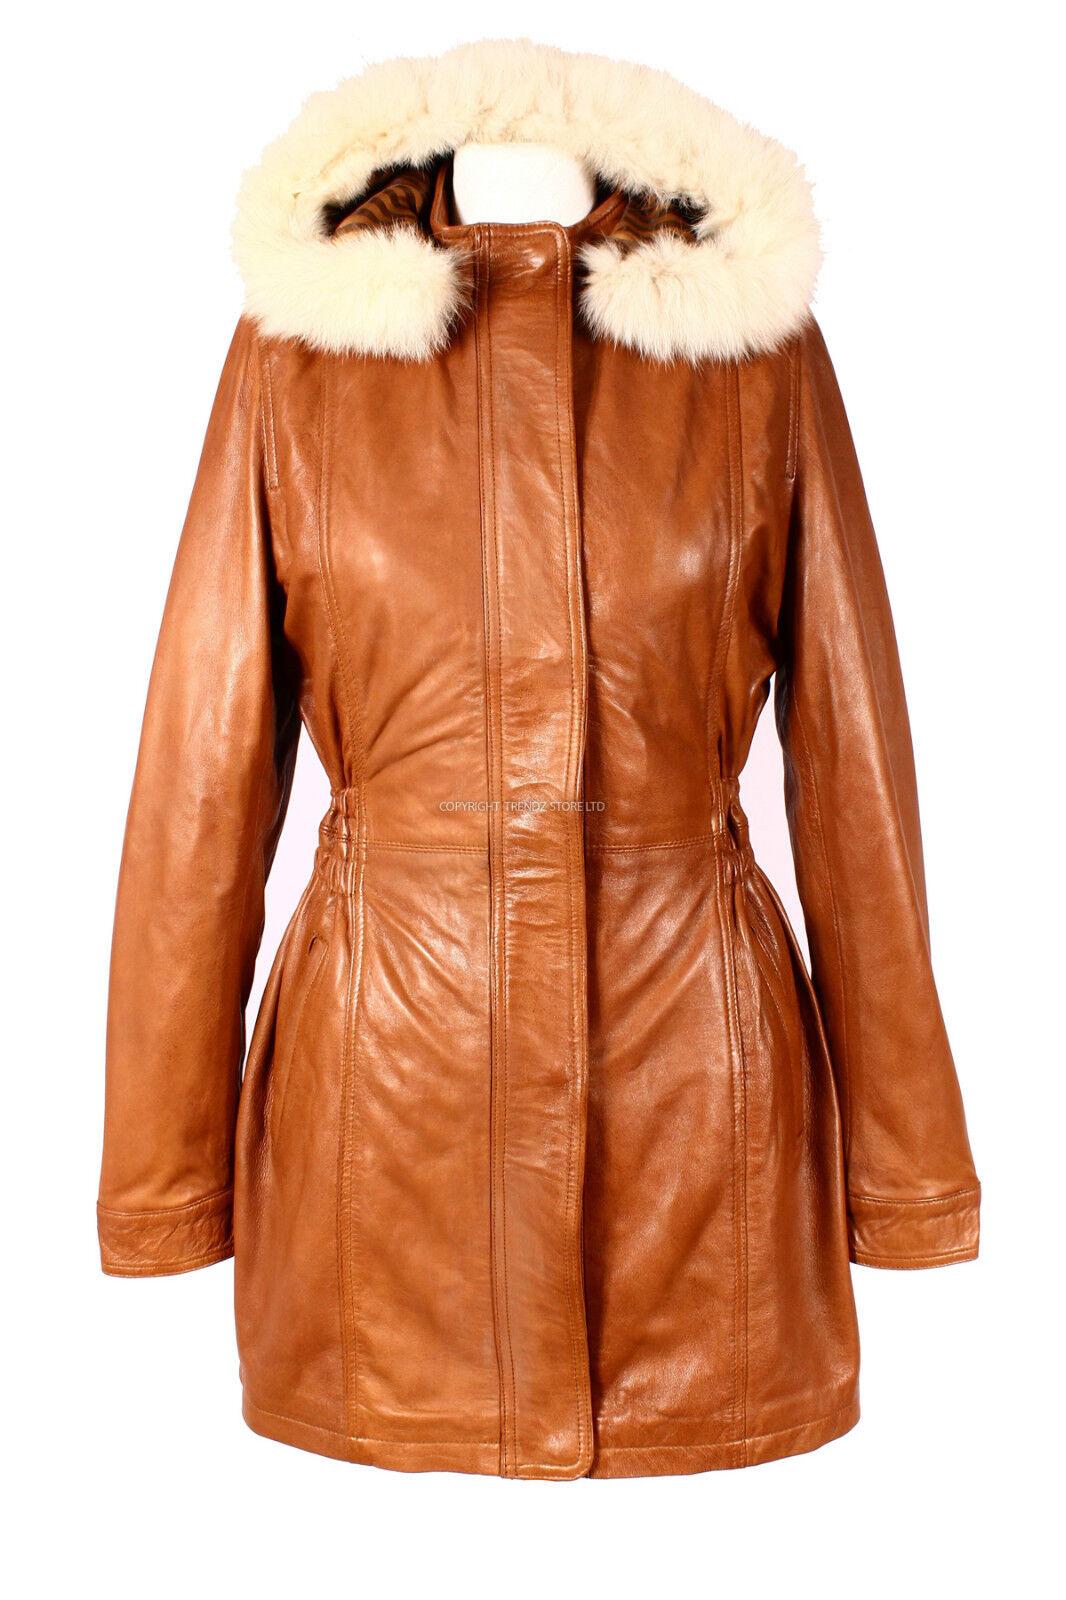 ALANA Tan Ladies New Fur Hooded Knee Length Real Lambskin Designer Leather Coat